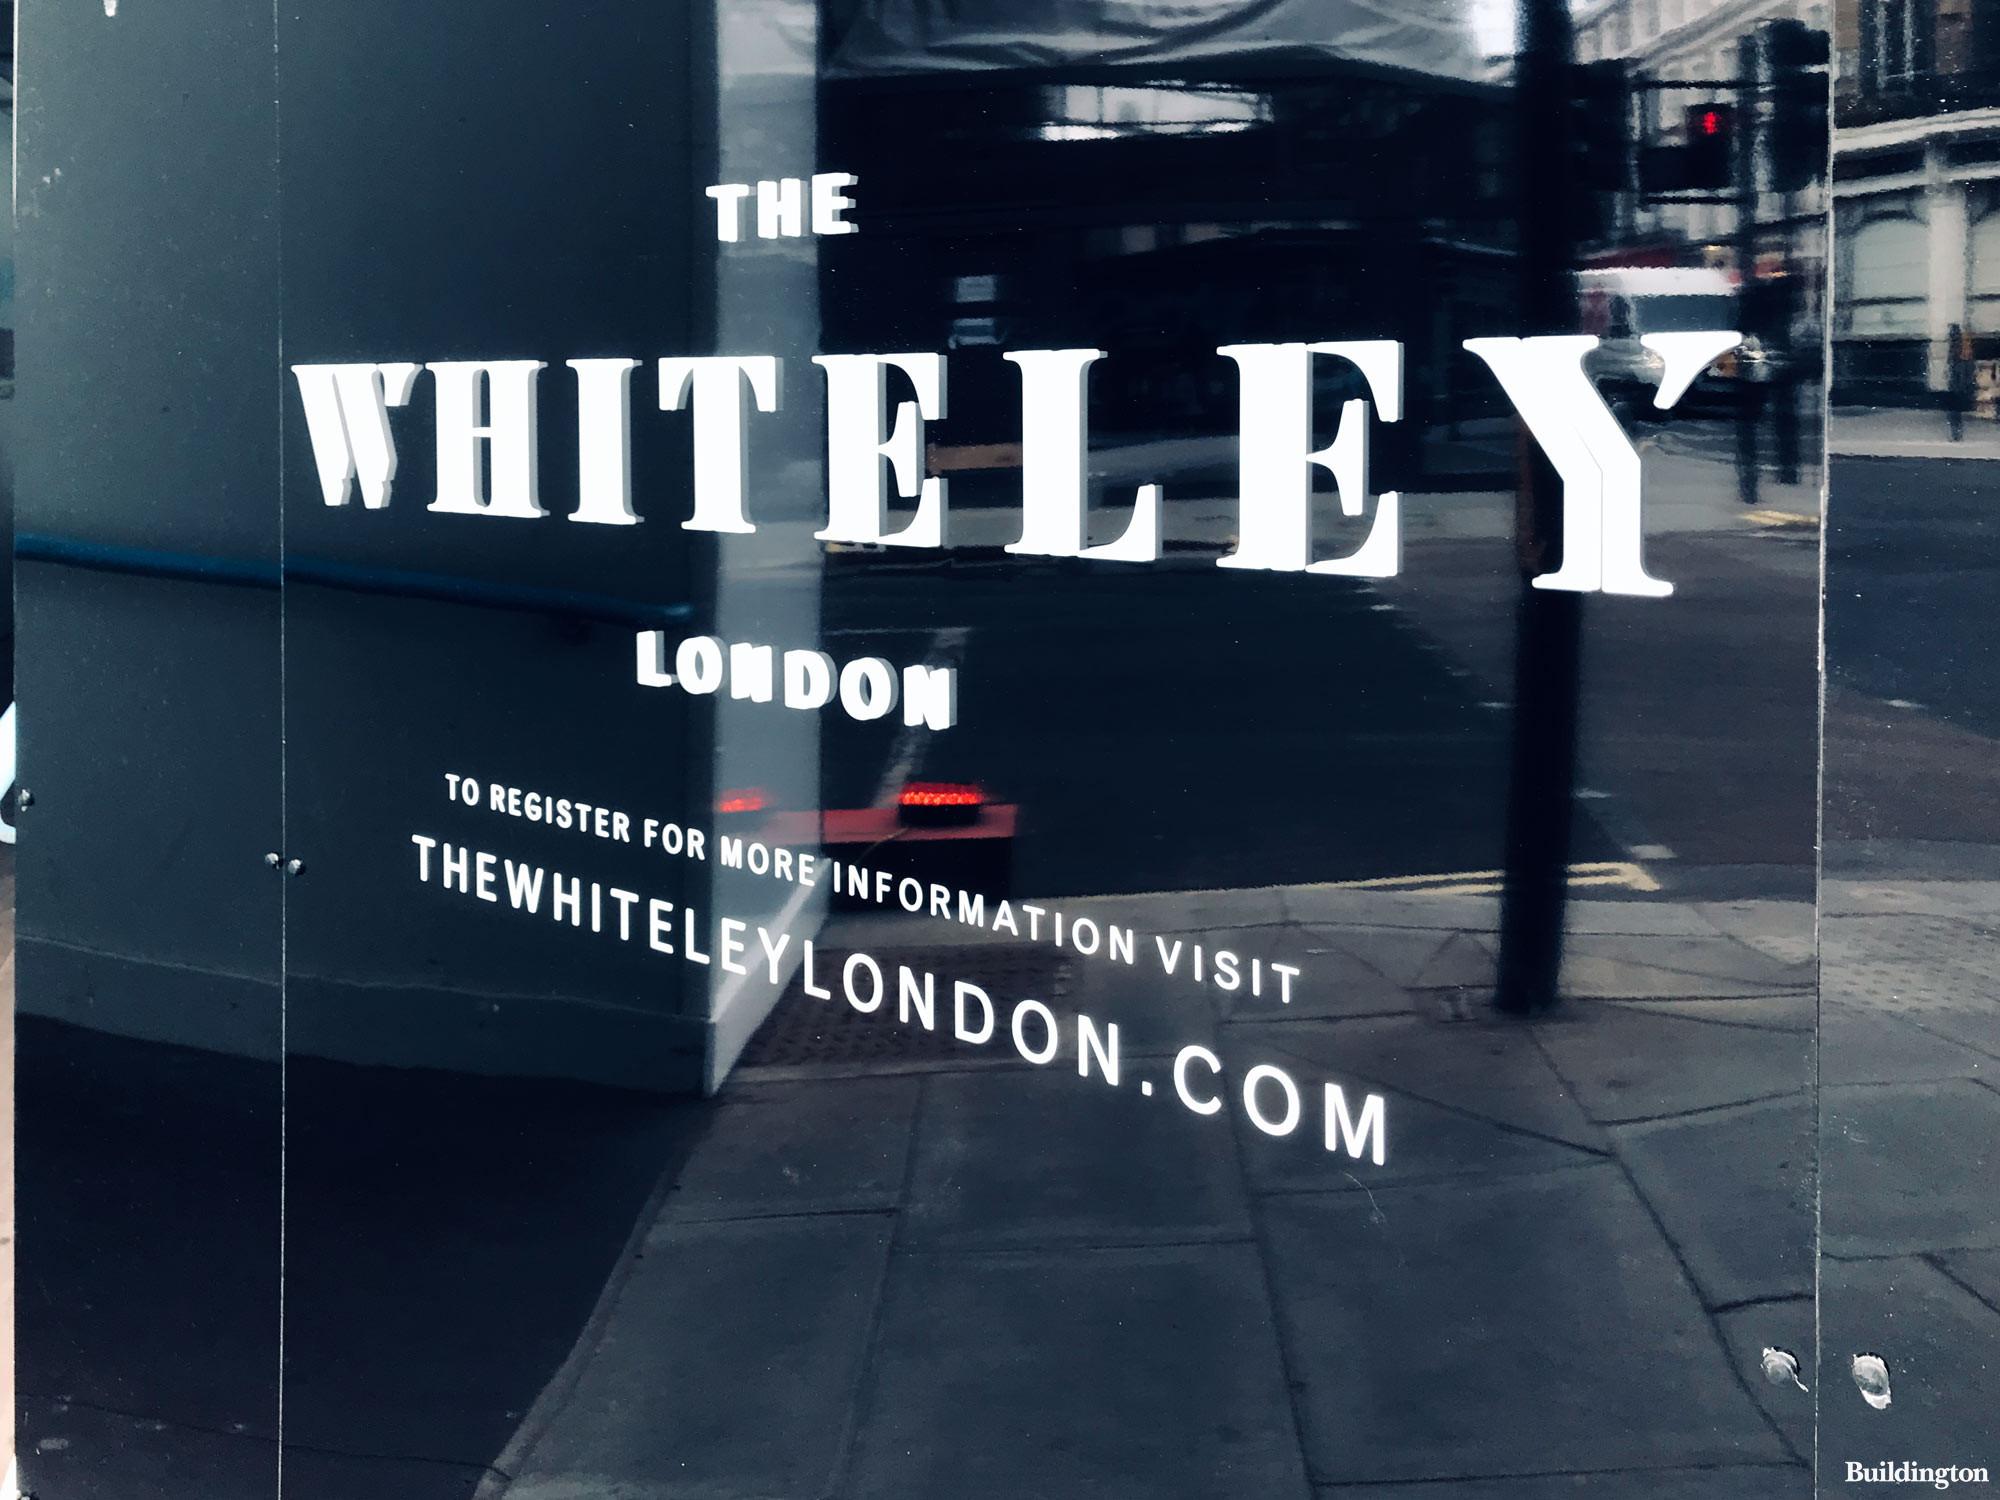 The Whiteley development hoarding in April 2021.